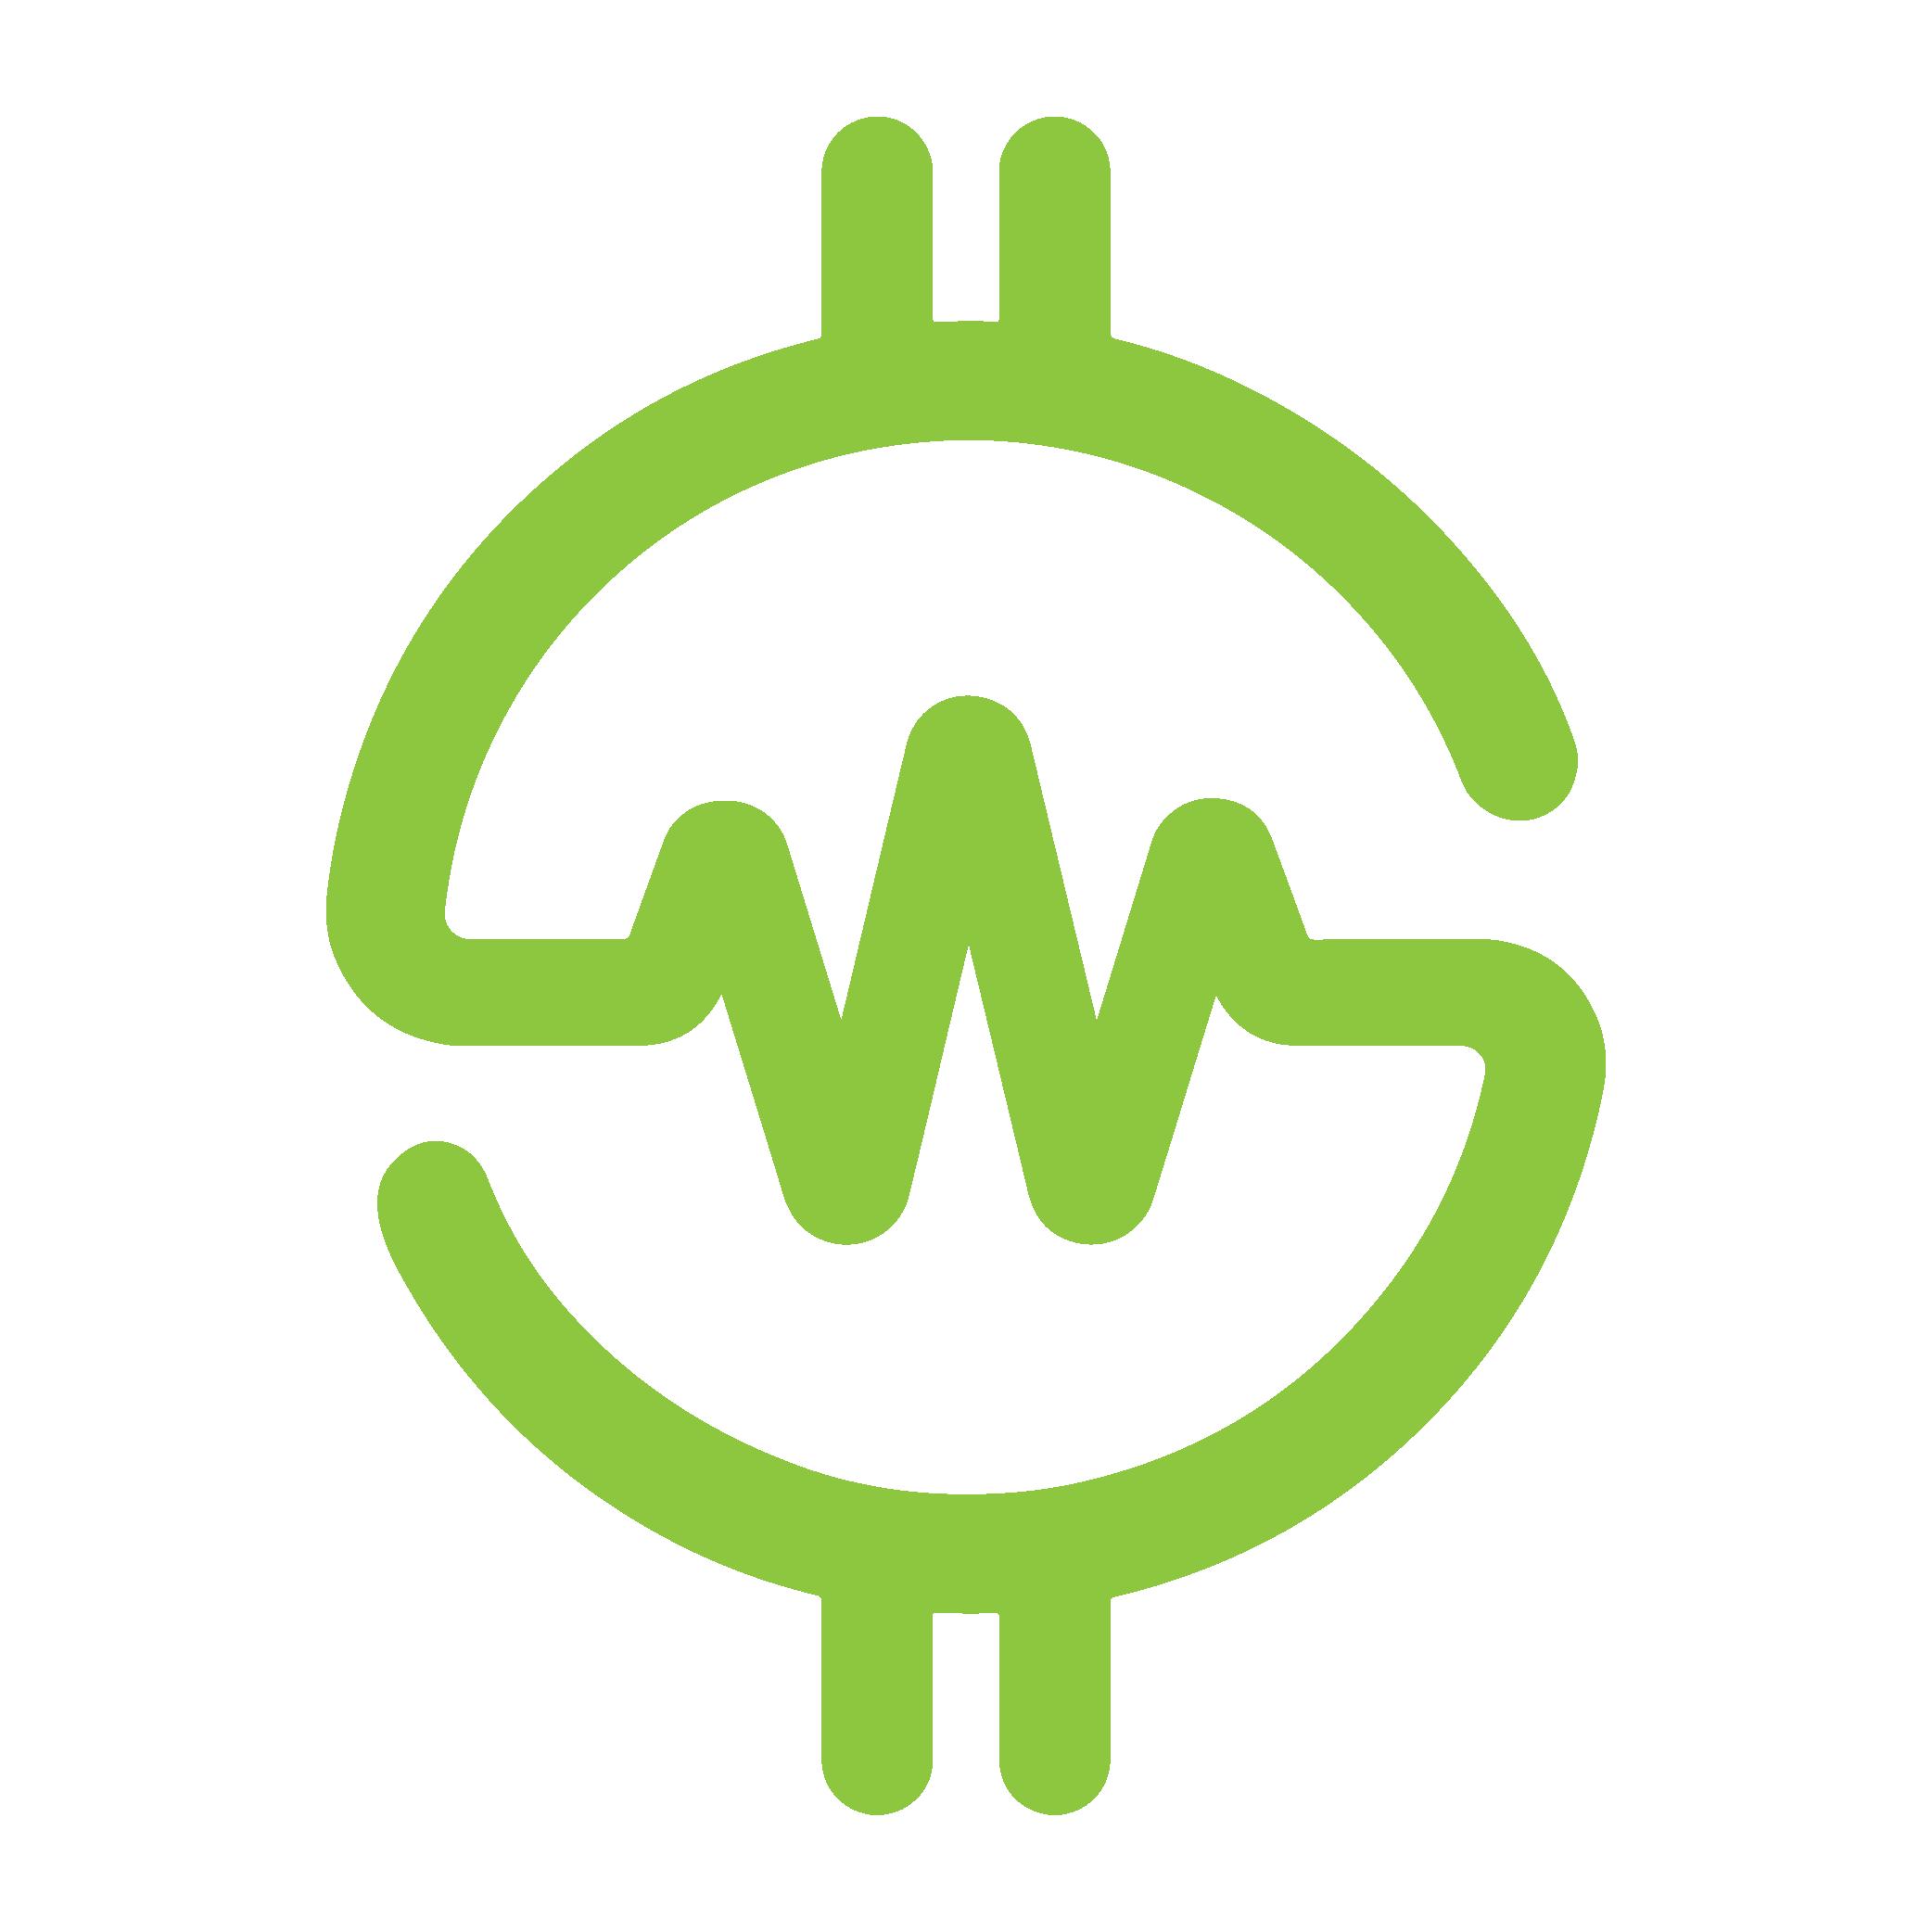 WENATURE-(-WENA-)-token-logo